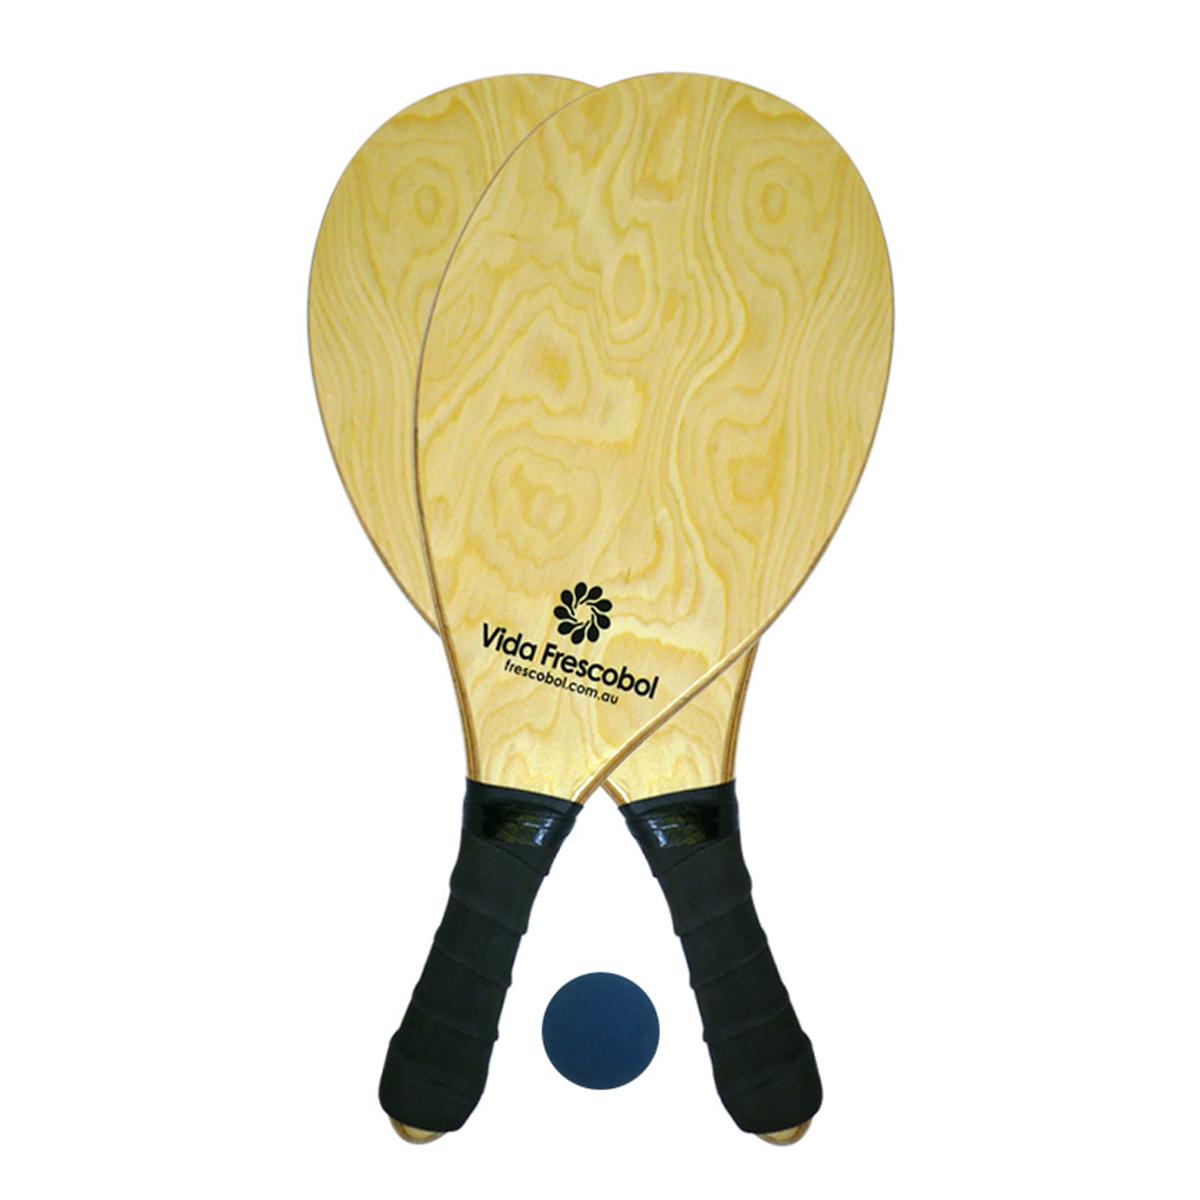 Vida Frescobol Blond Grain Beach Paddleball Racquet Set